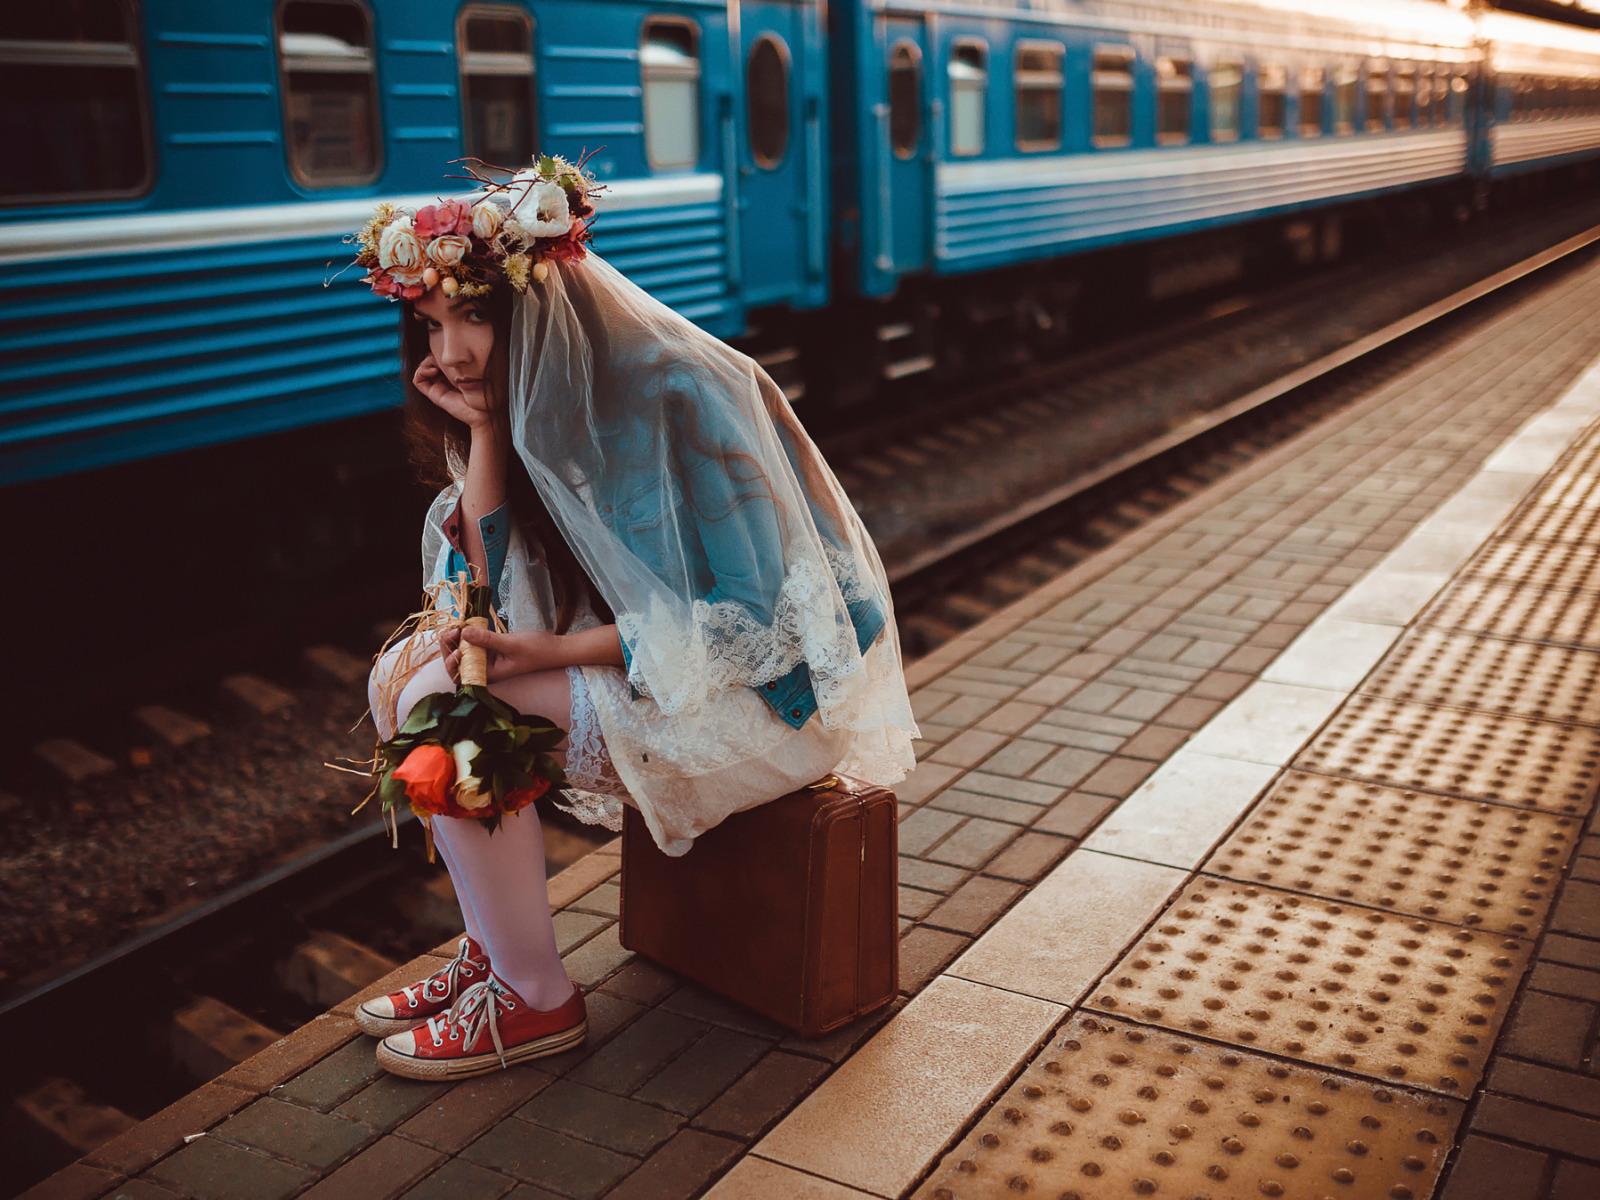 картинки навстречу поезду татарника